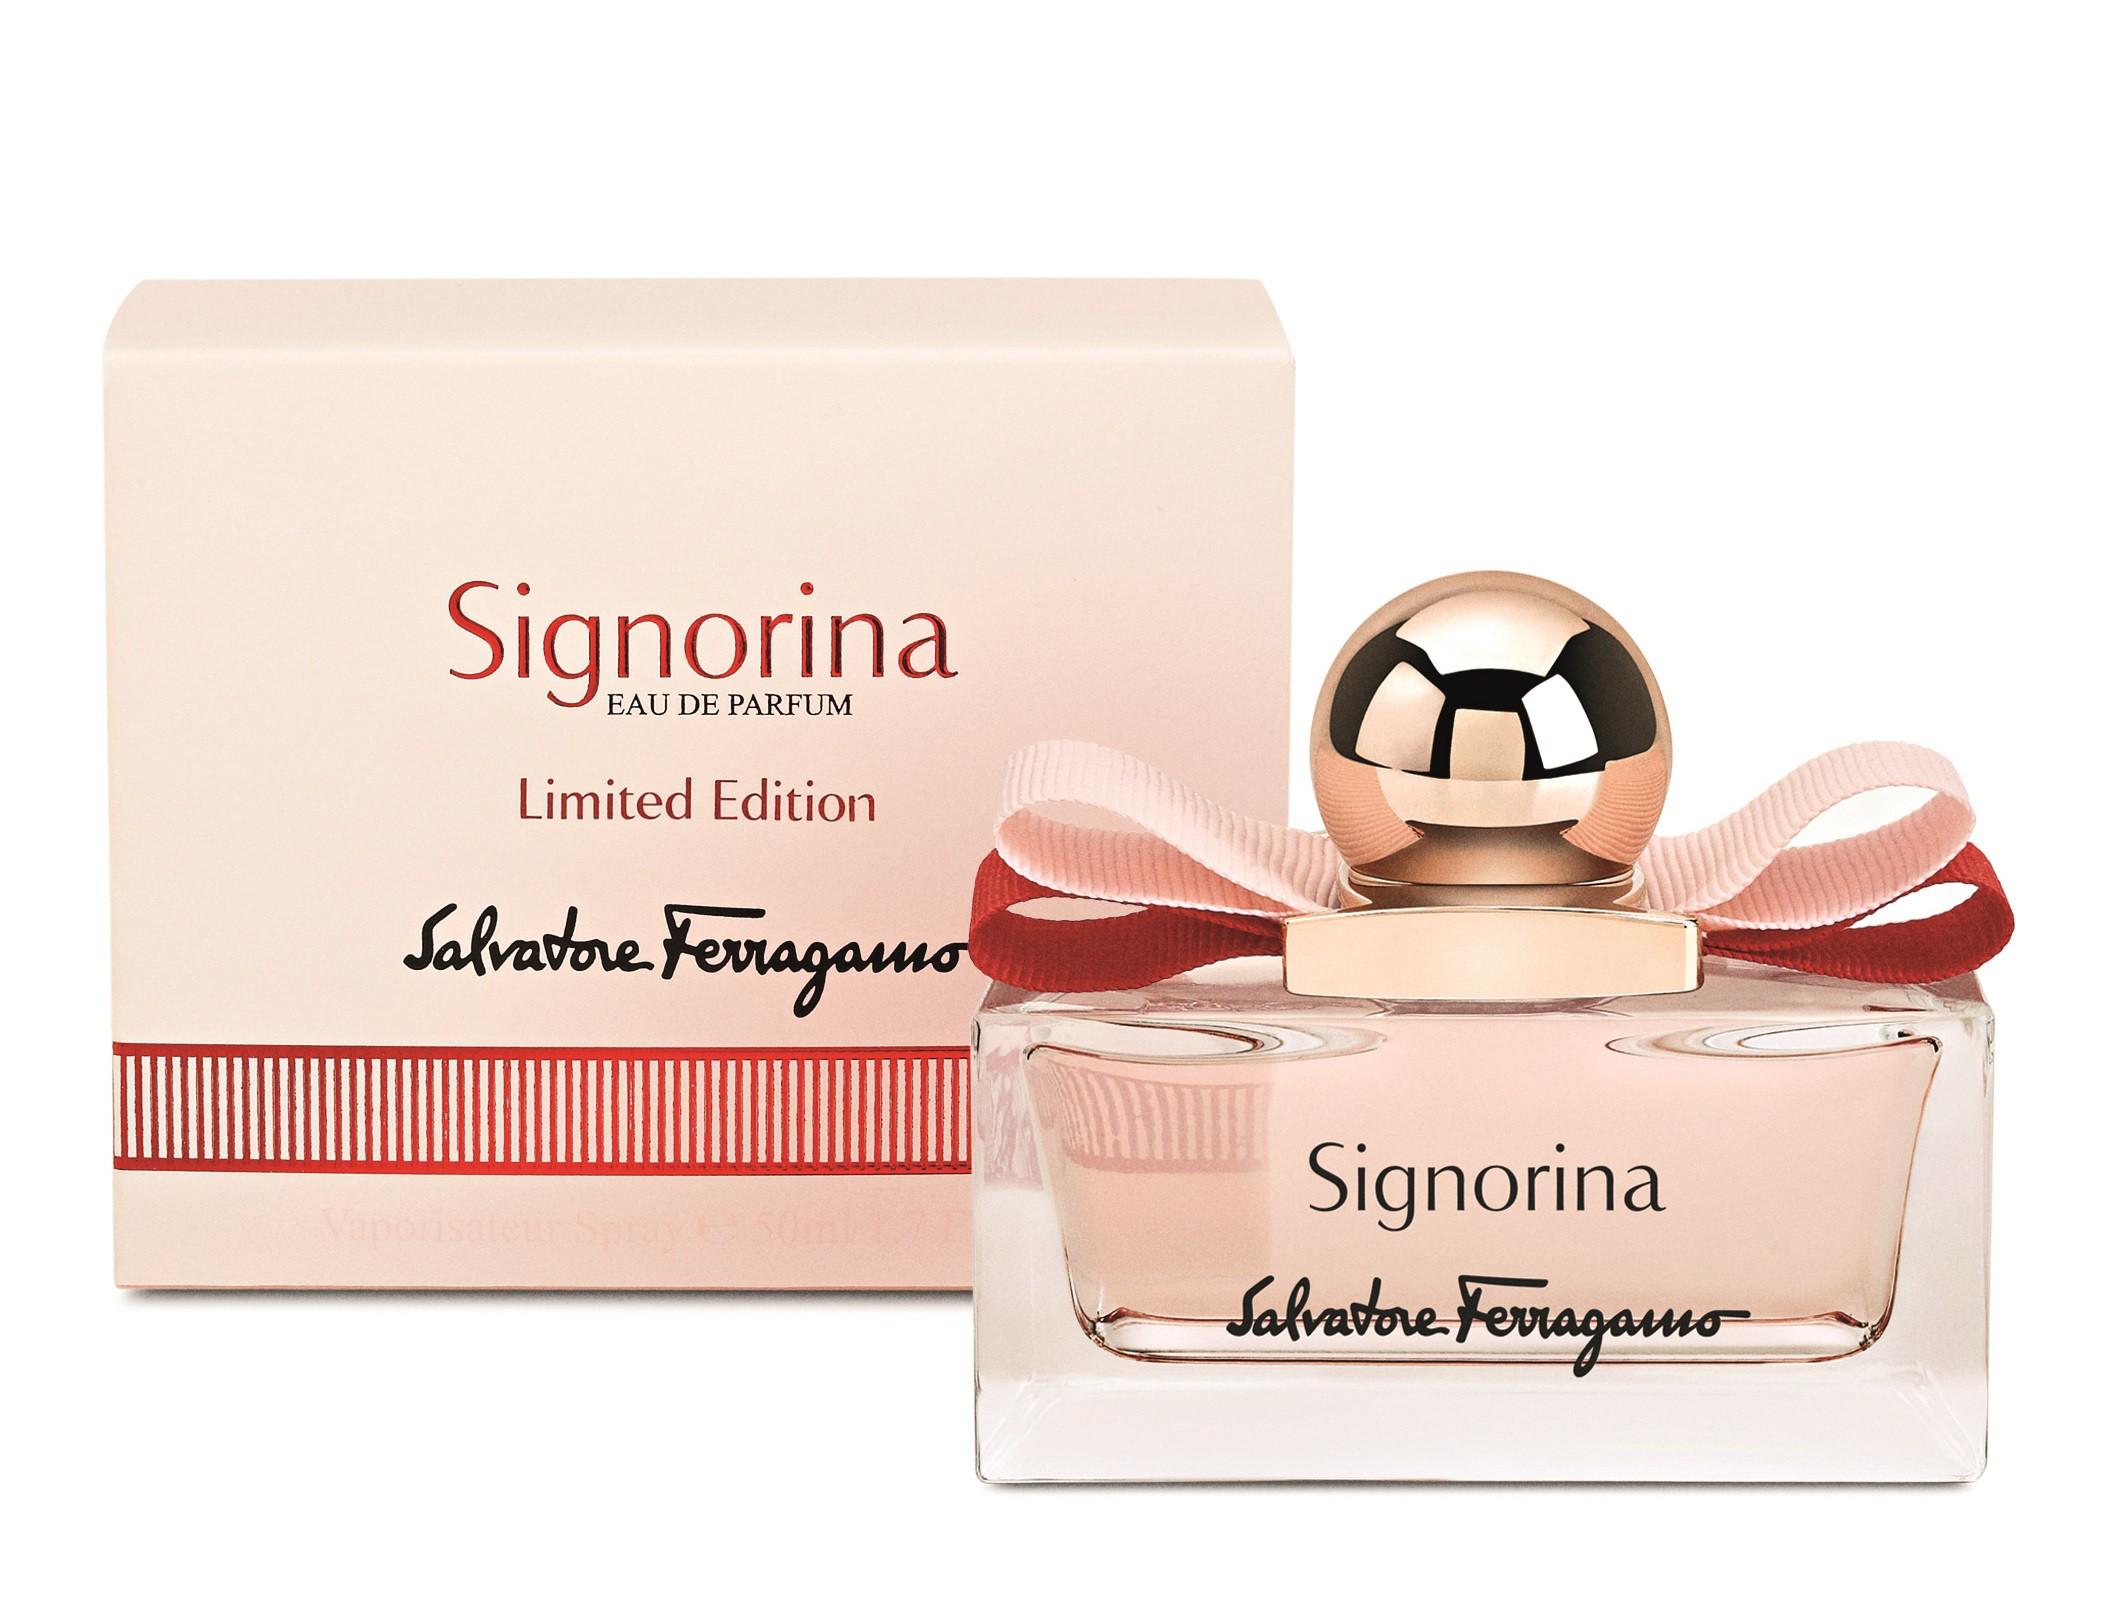 Salvatore Ferragamo Signorina Limited Edition аромат для женщин